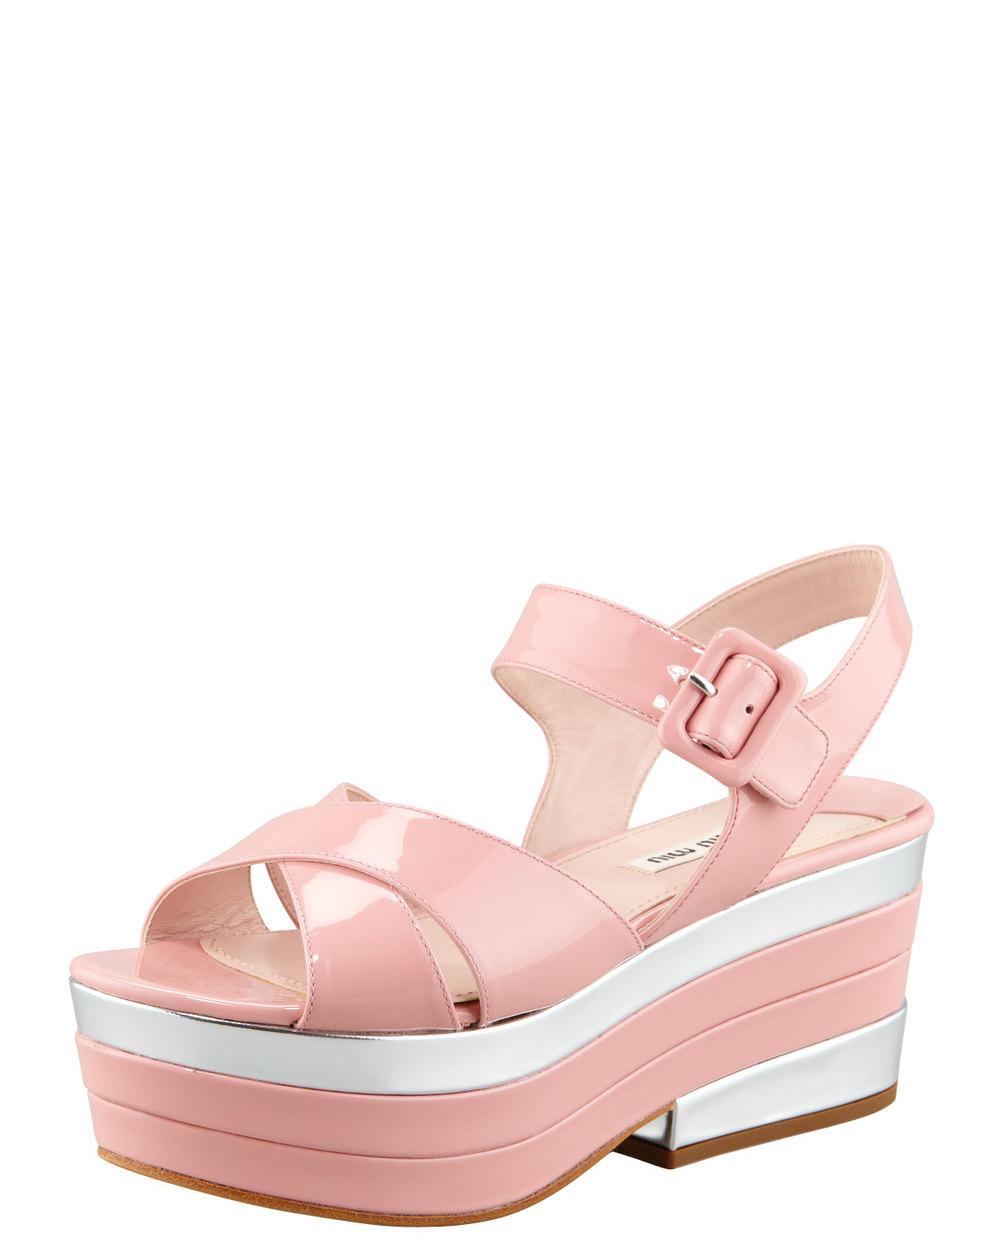 Miu Miu Patent leather sandals, on sale